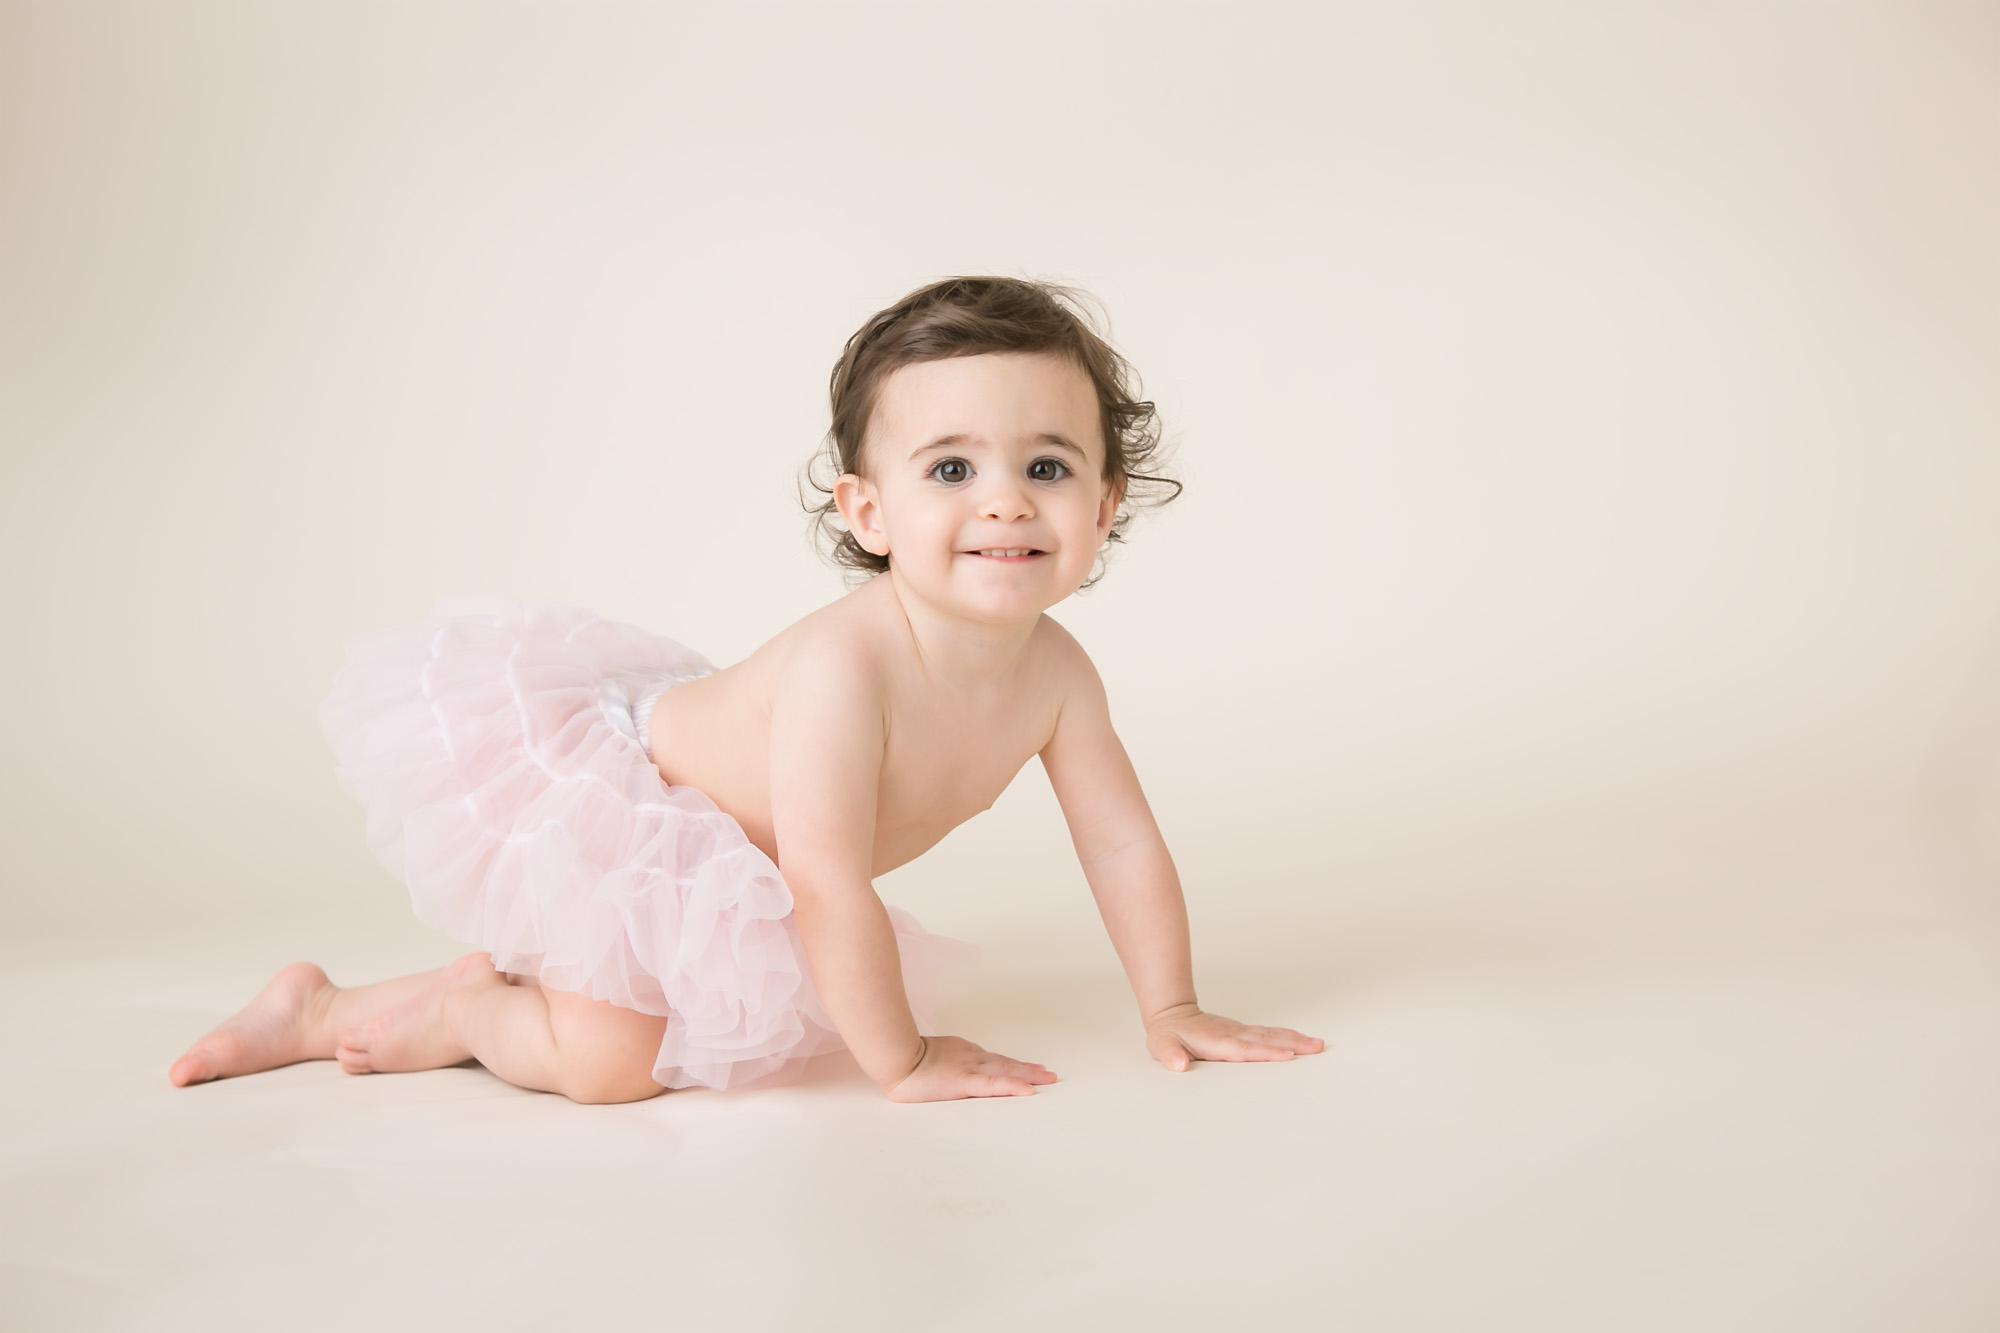 one year picture baby girl tutu columbus ohio